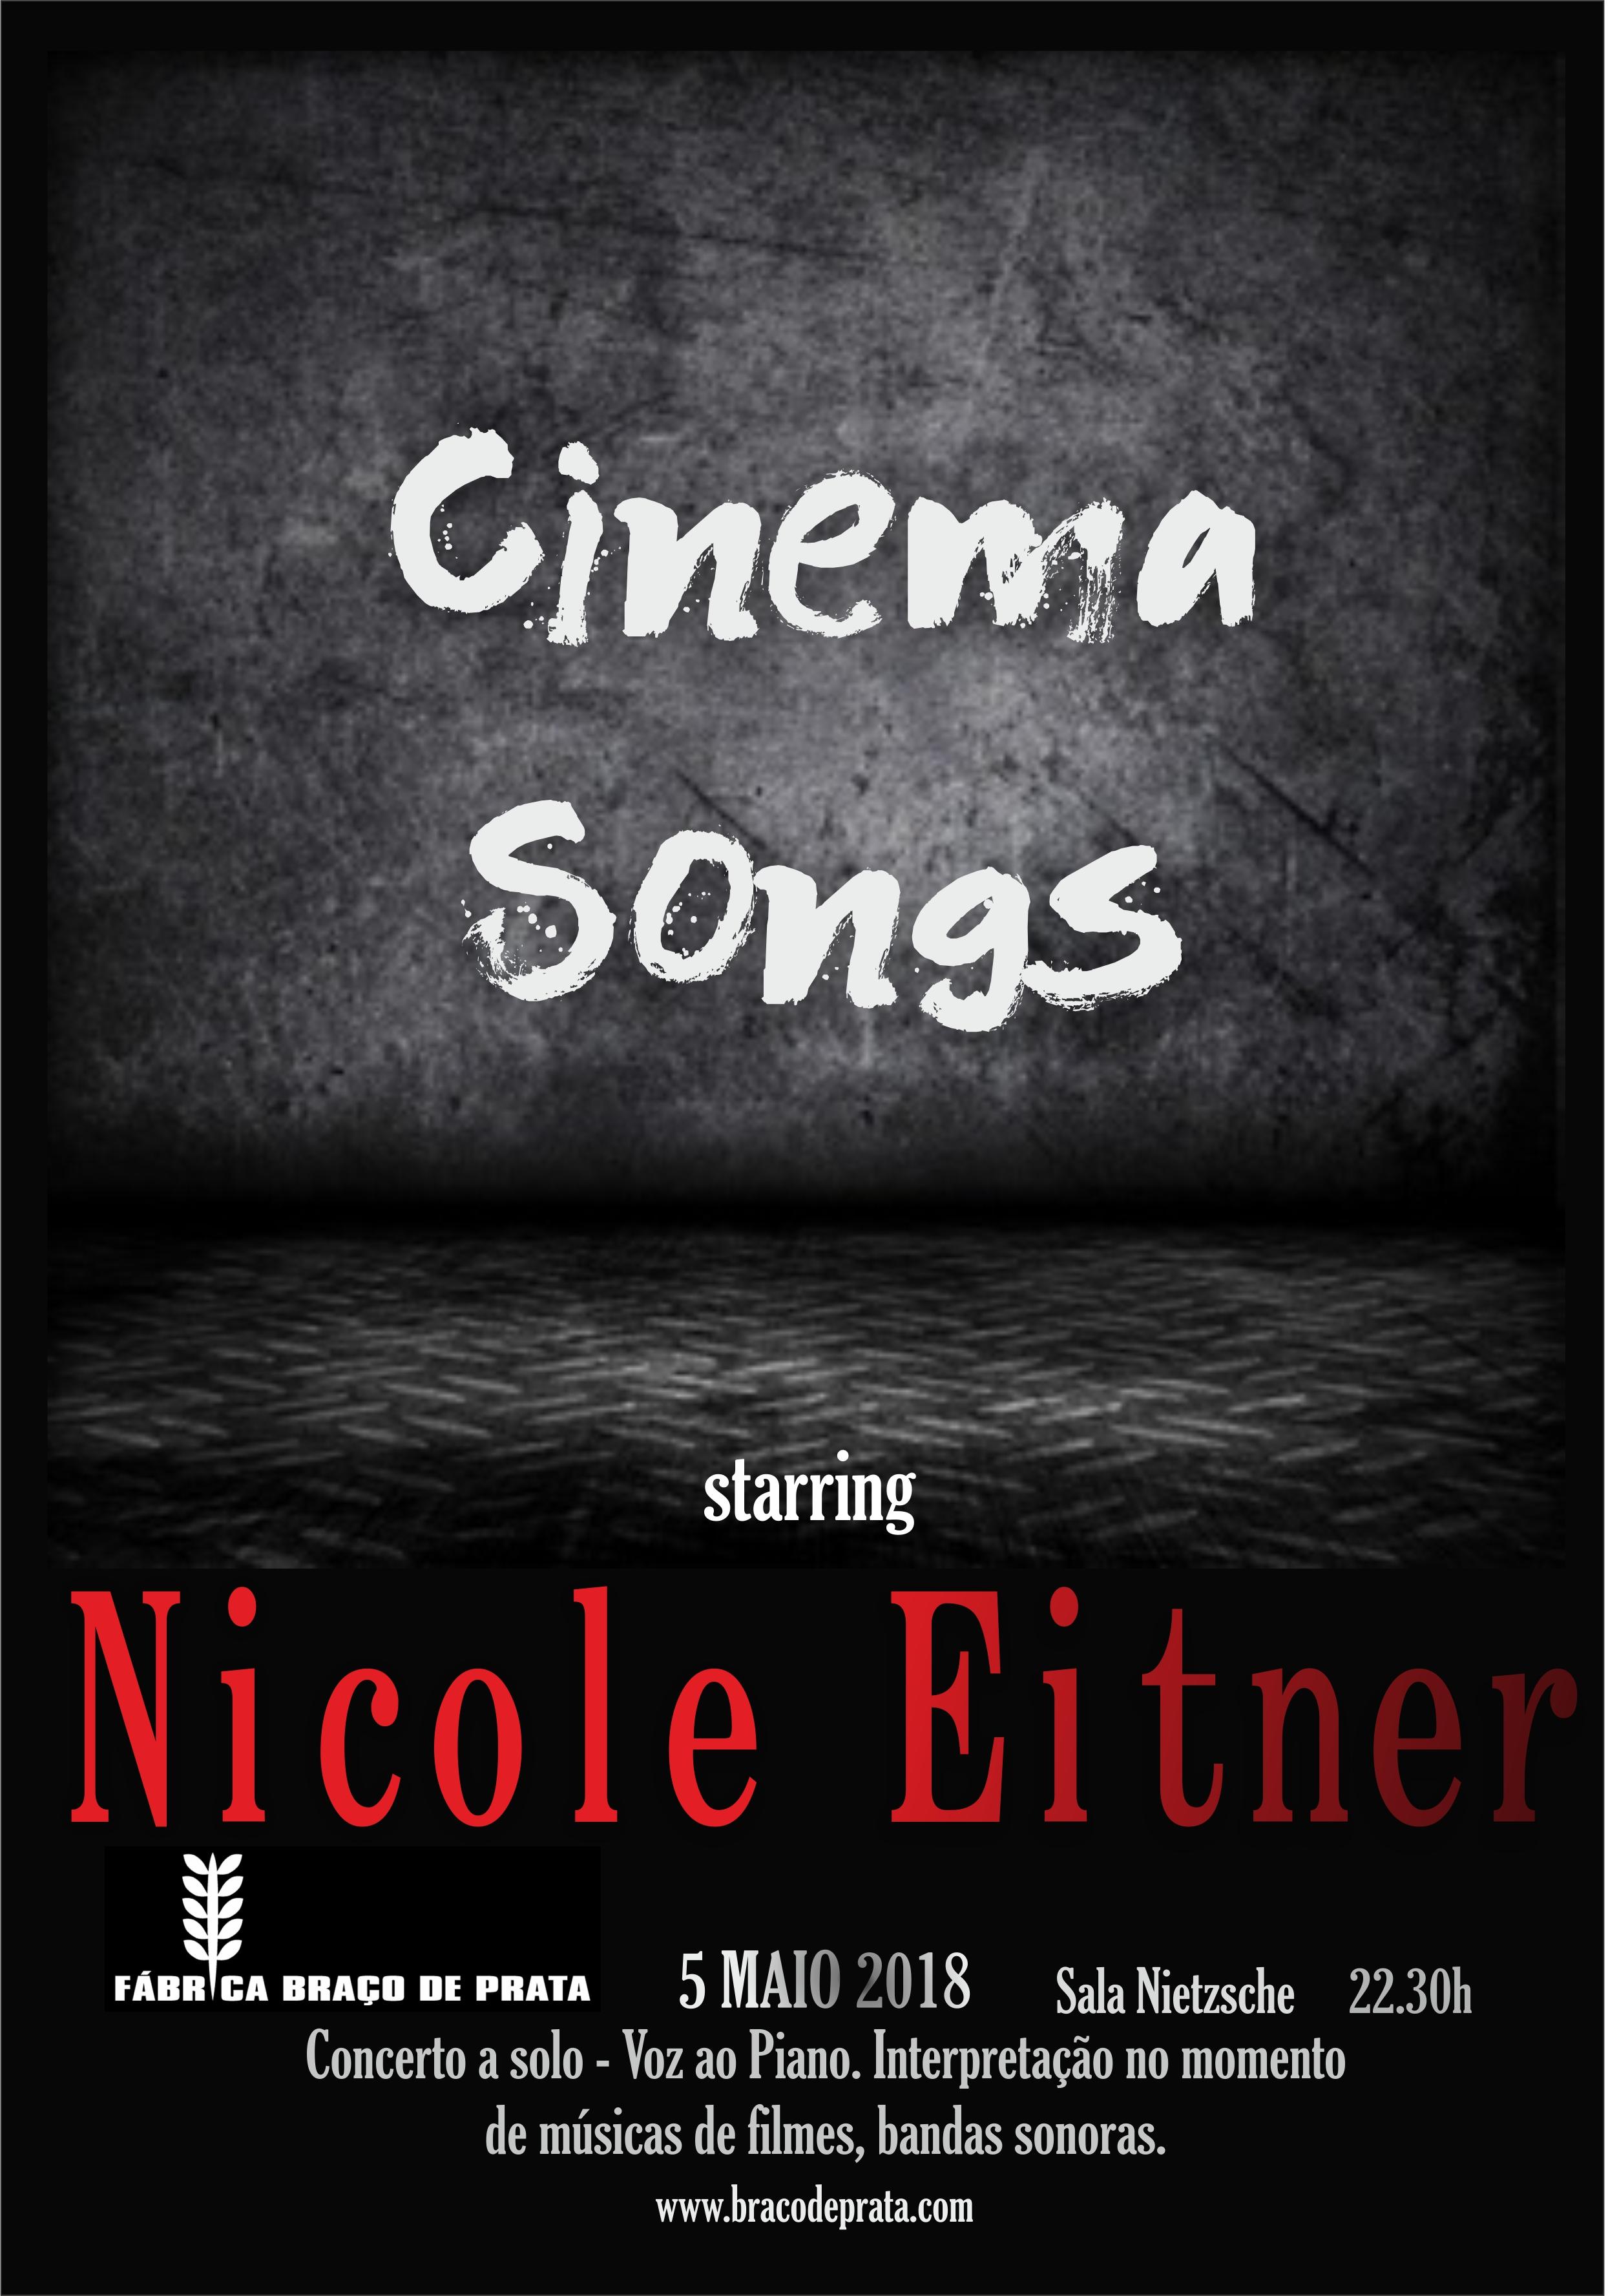 5 Maio 2018 Cinema Songs